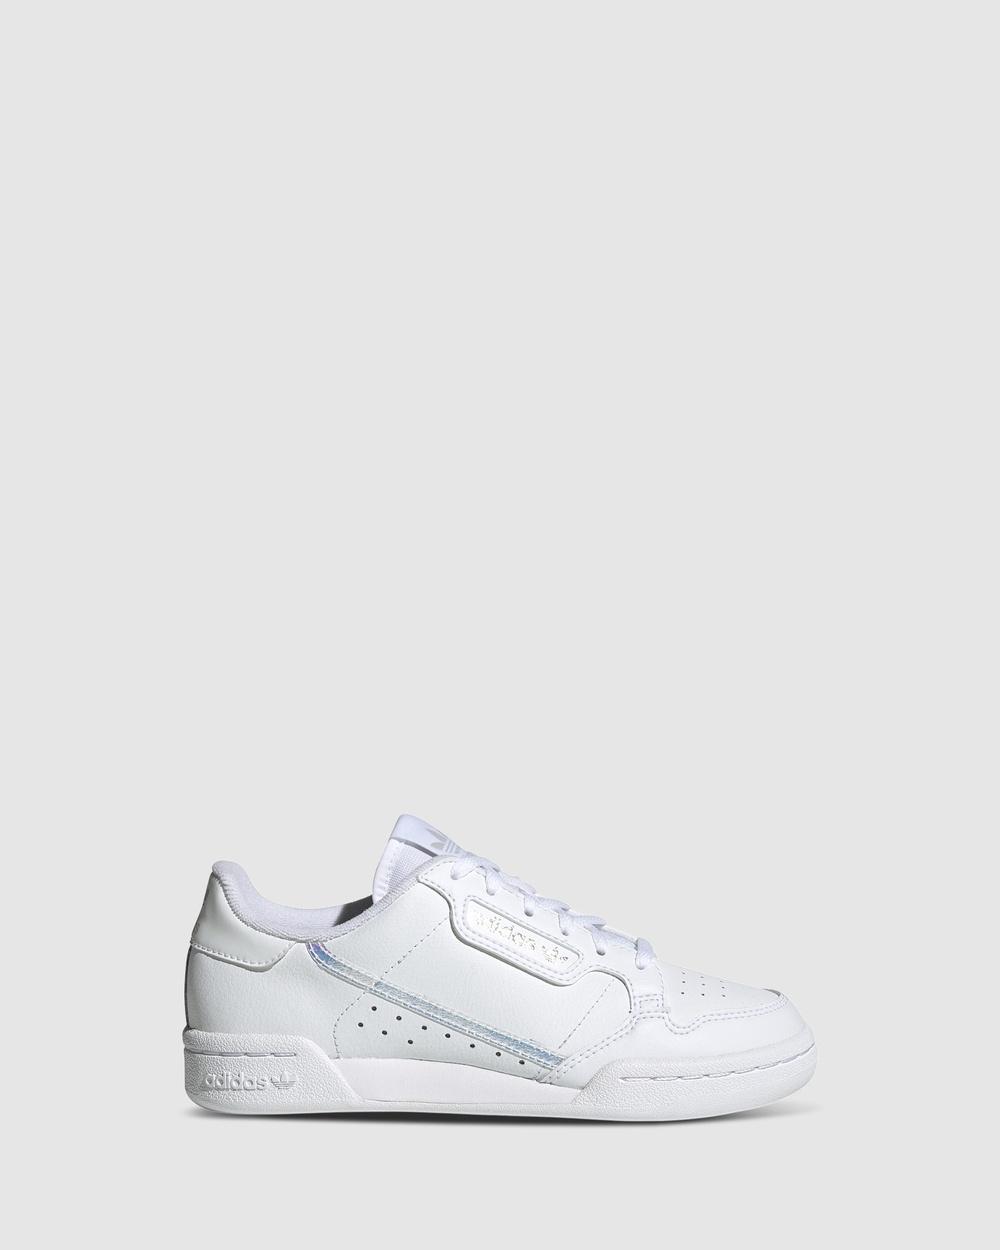 adidas Originals Continental 80 Grade School Sneakers White/Silver Hologram Australia